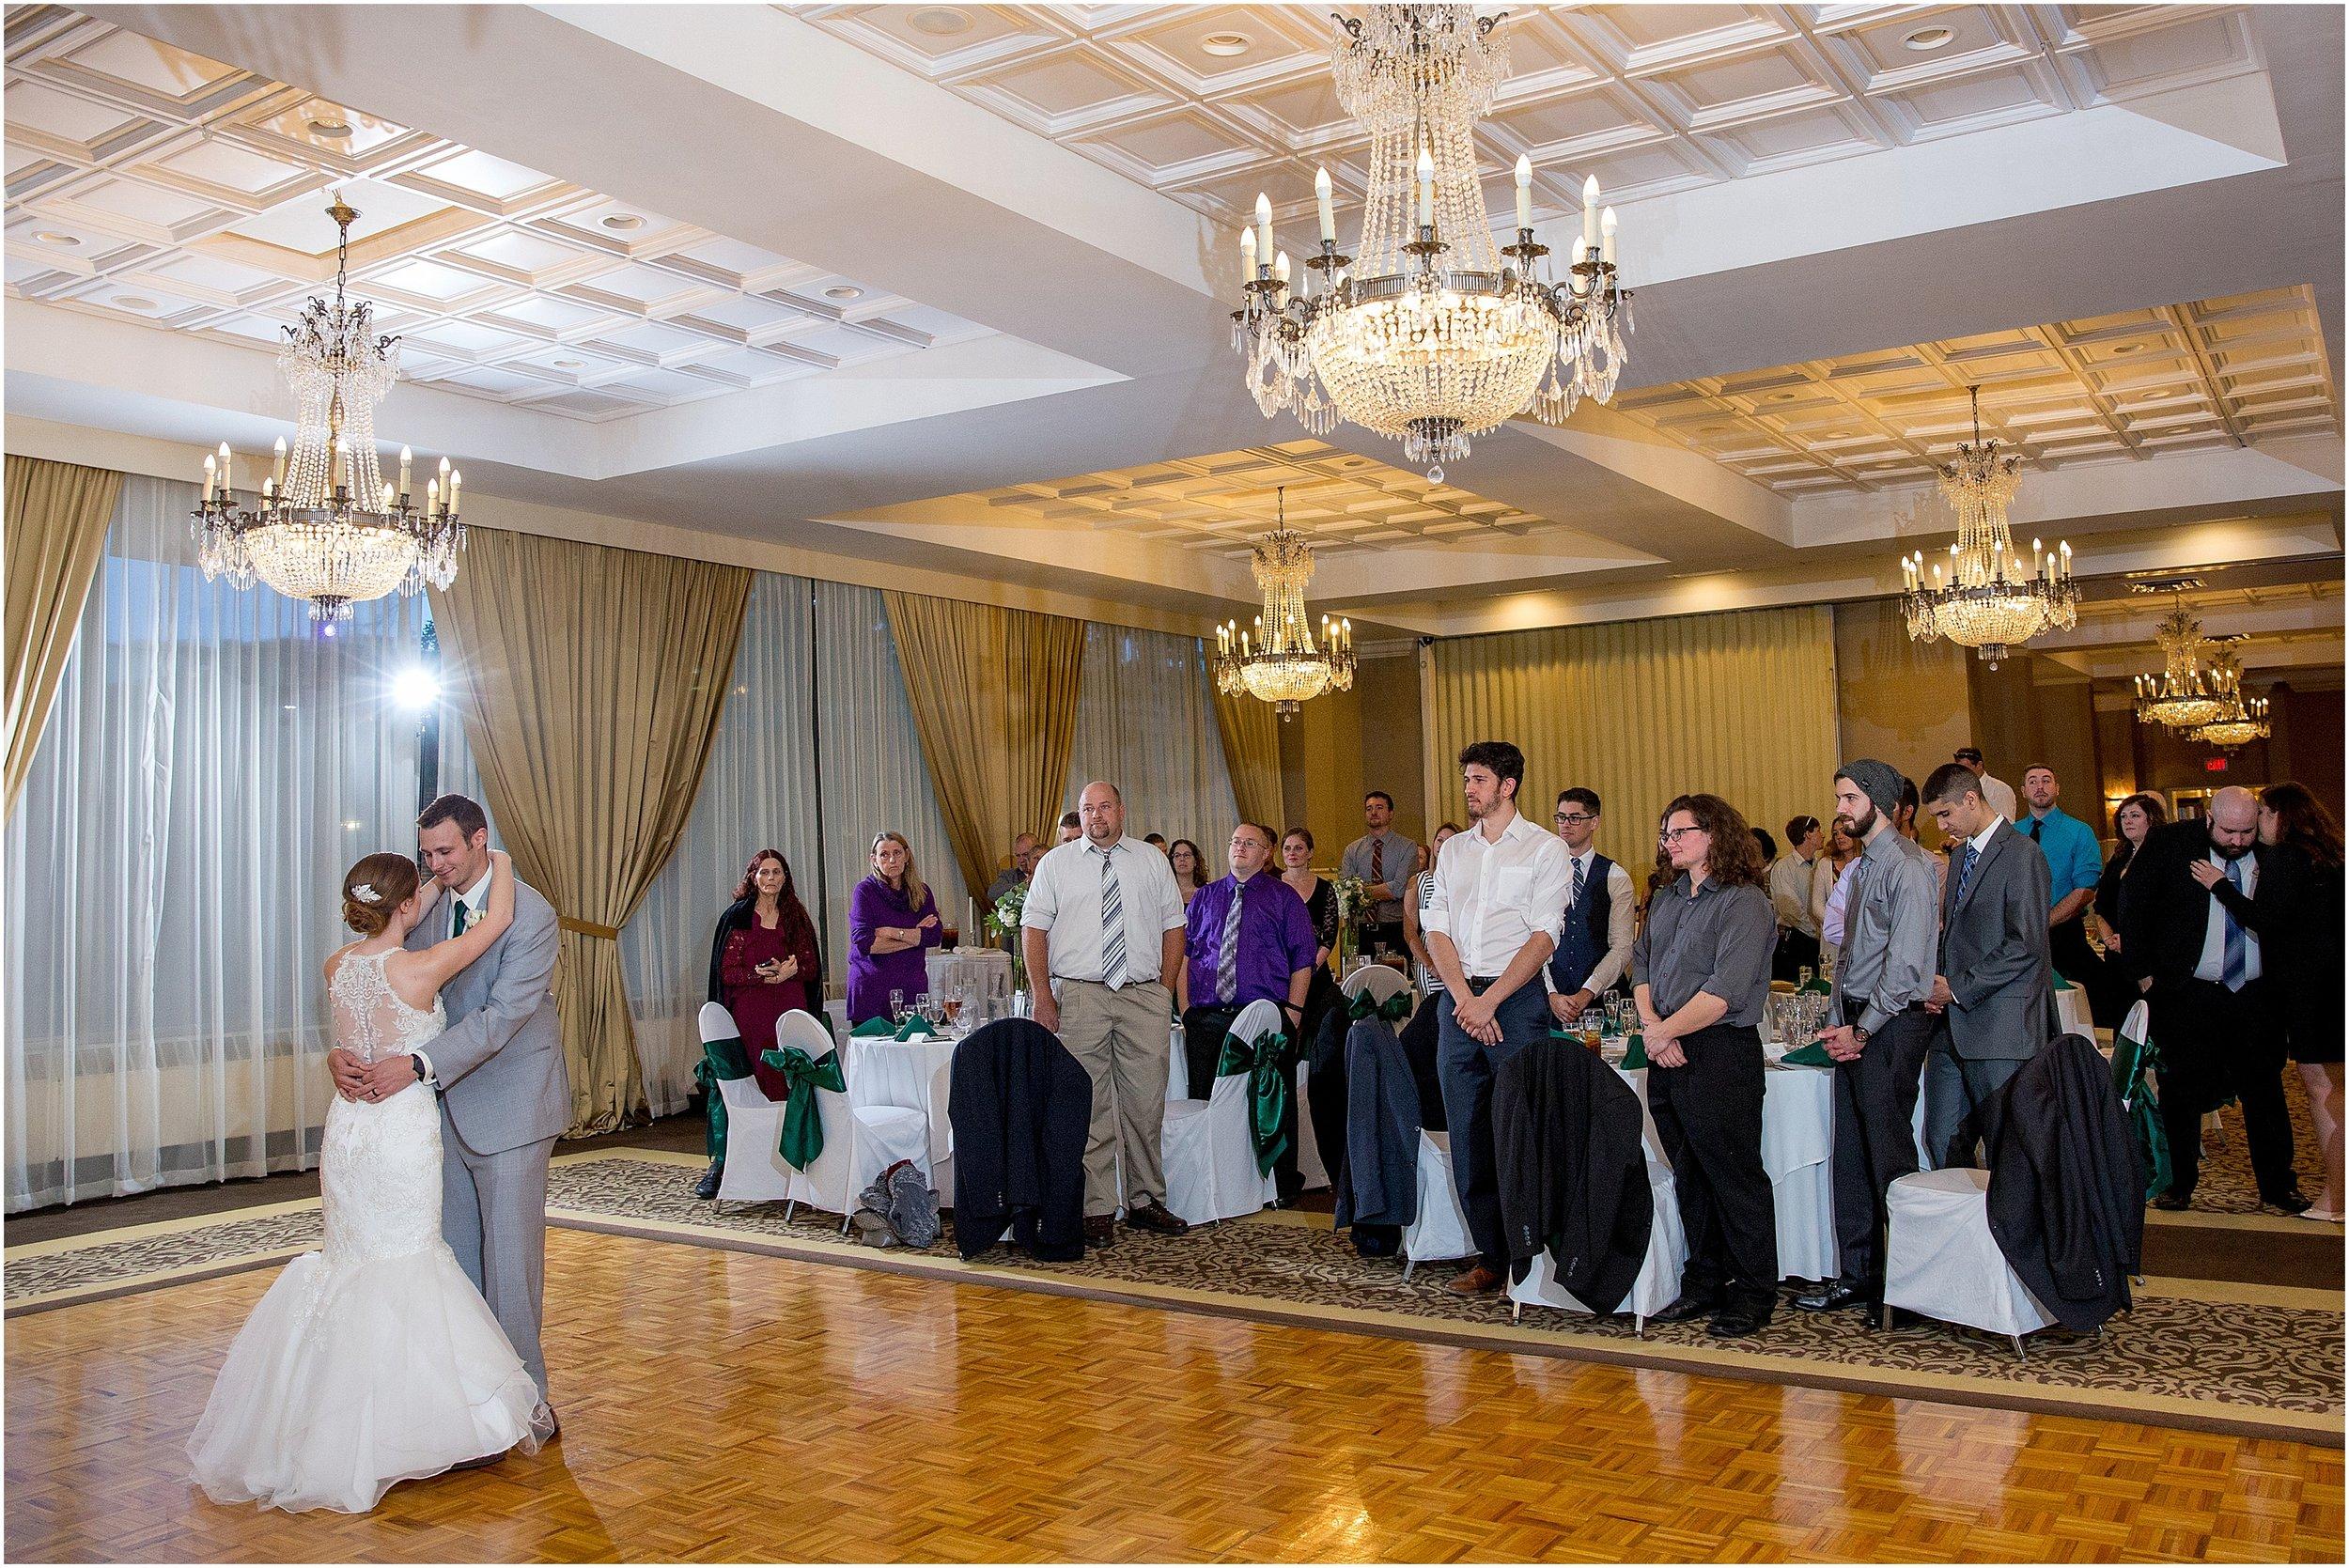 Williamsport_Wedding_0049.jpg